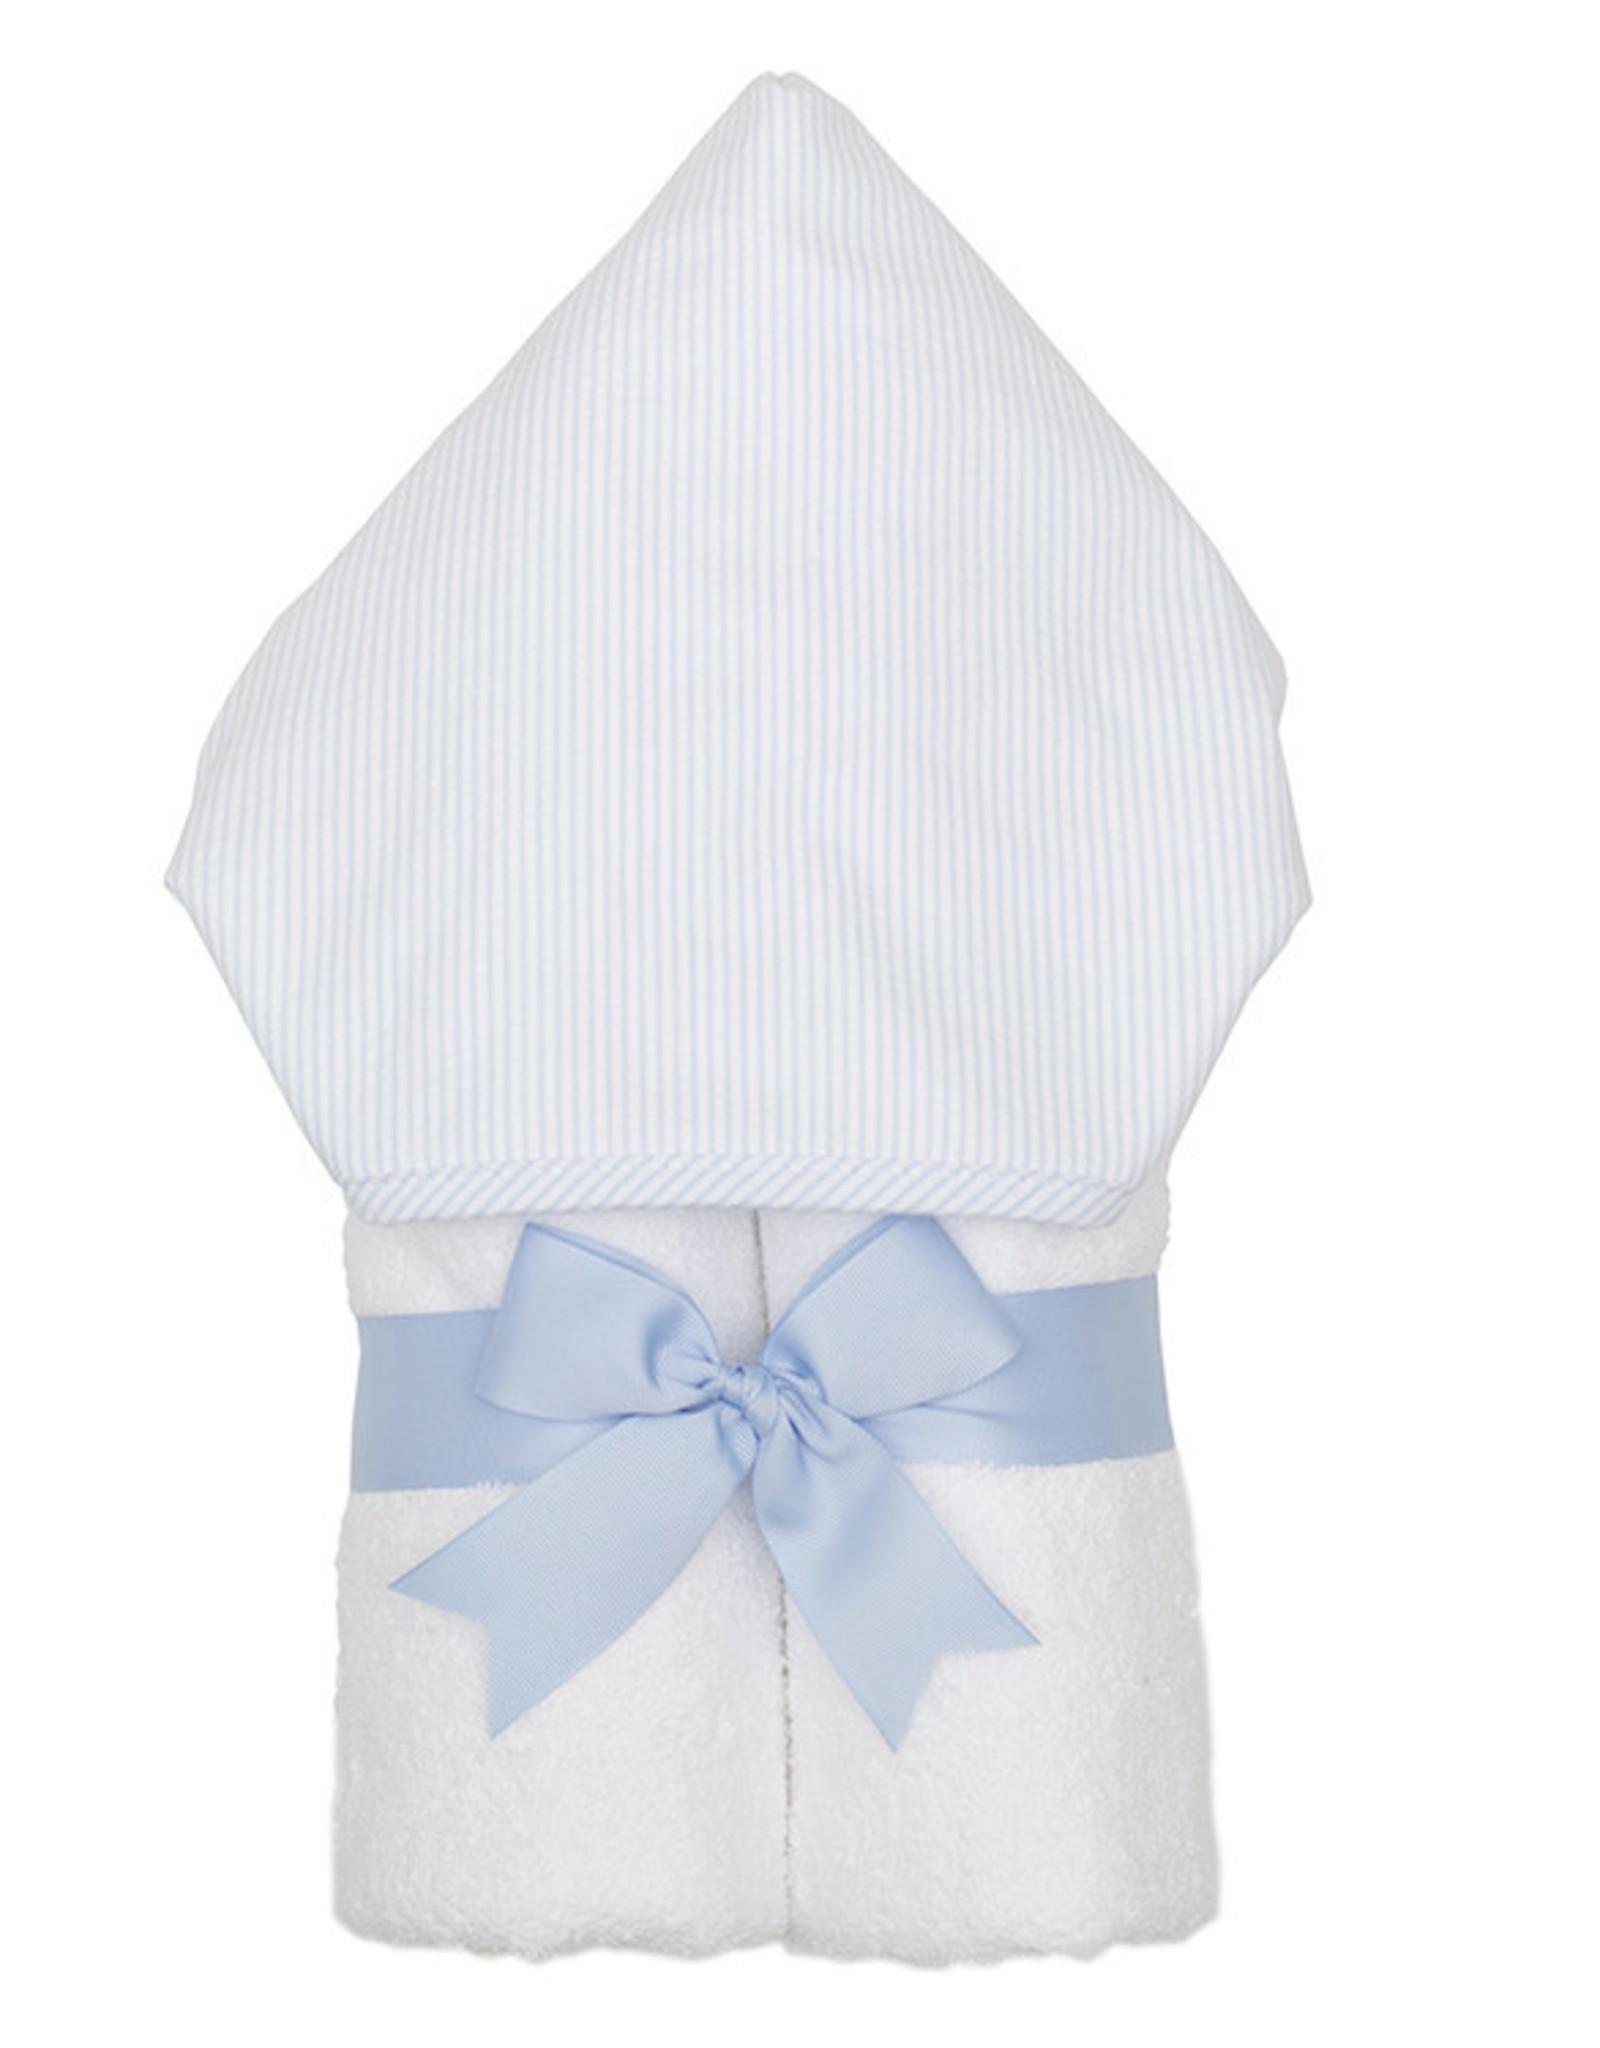 Three Marthas Everykid Towel Blue Seersucker